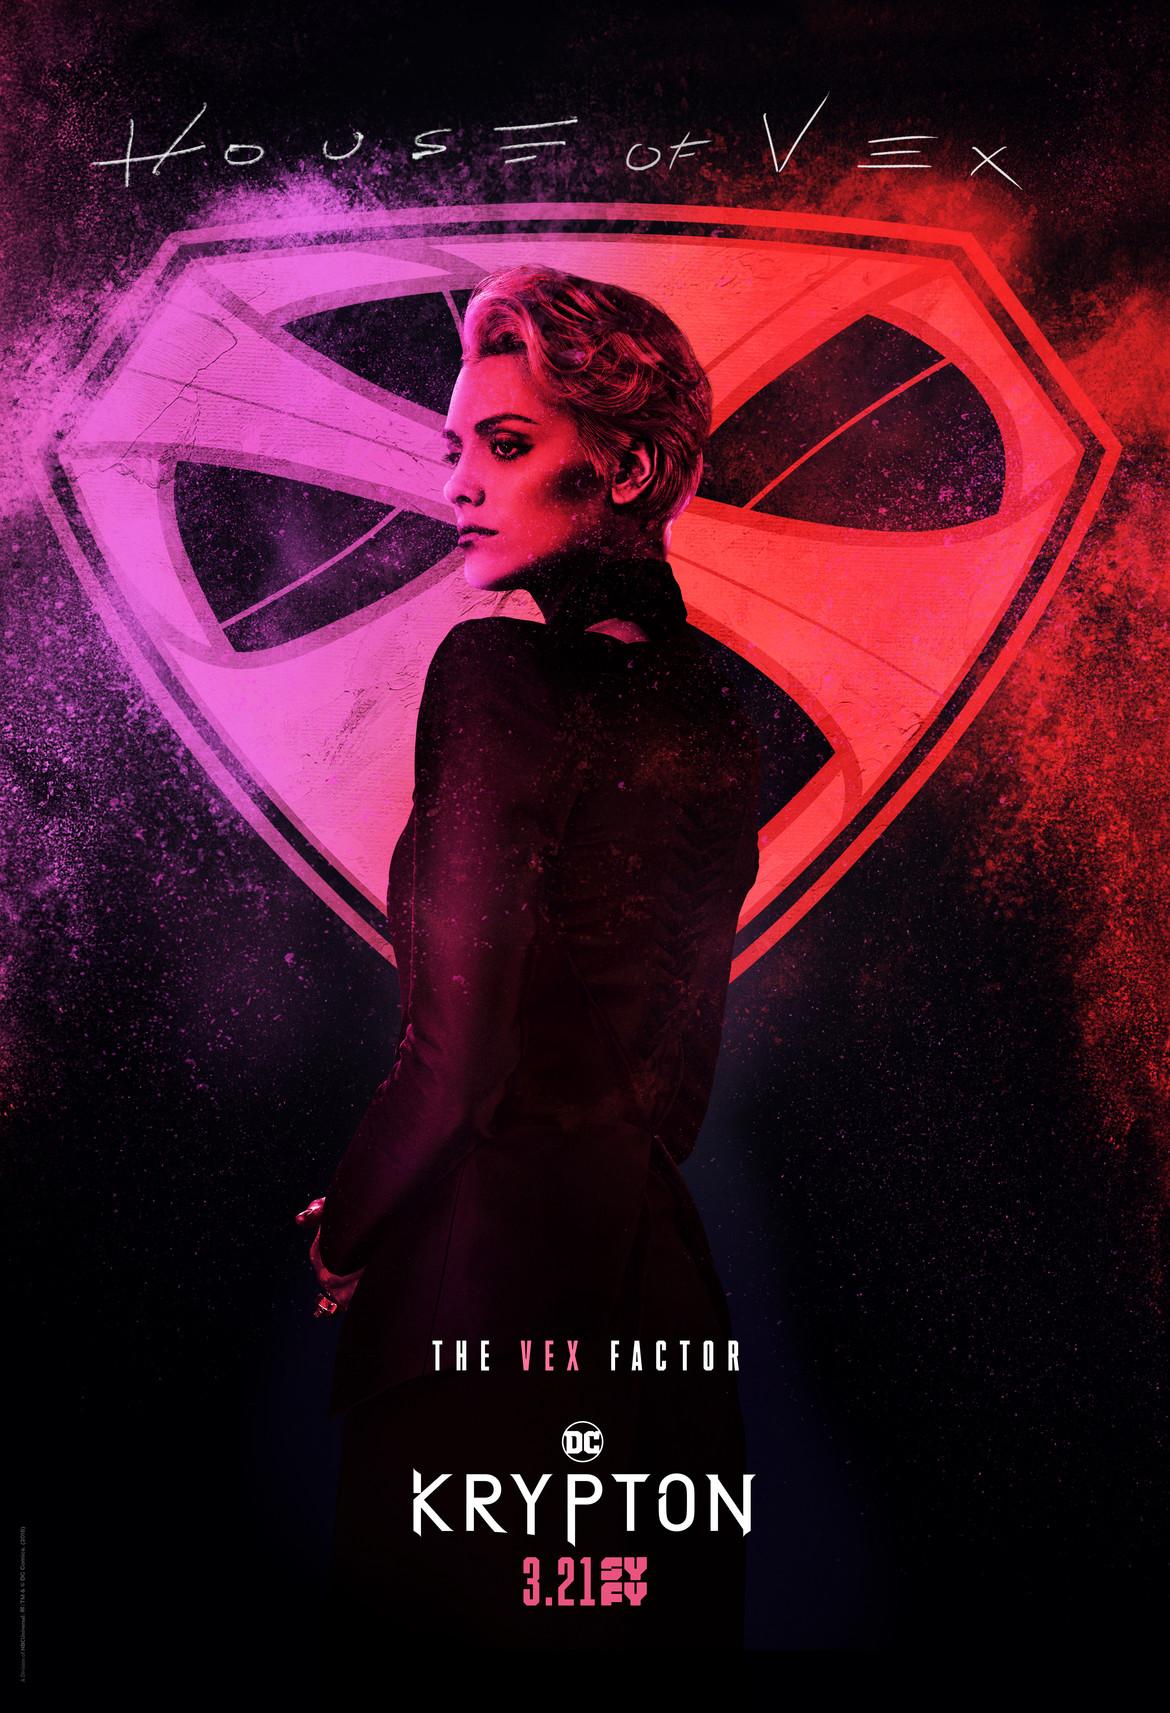 Krypton- Vex spraypaint poster